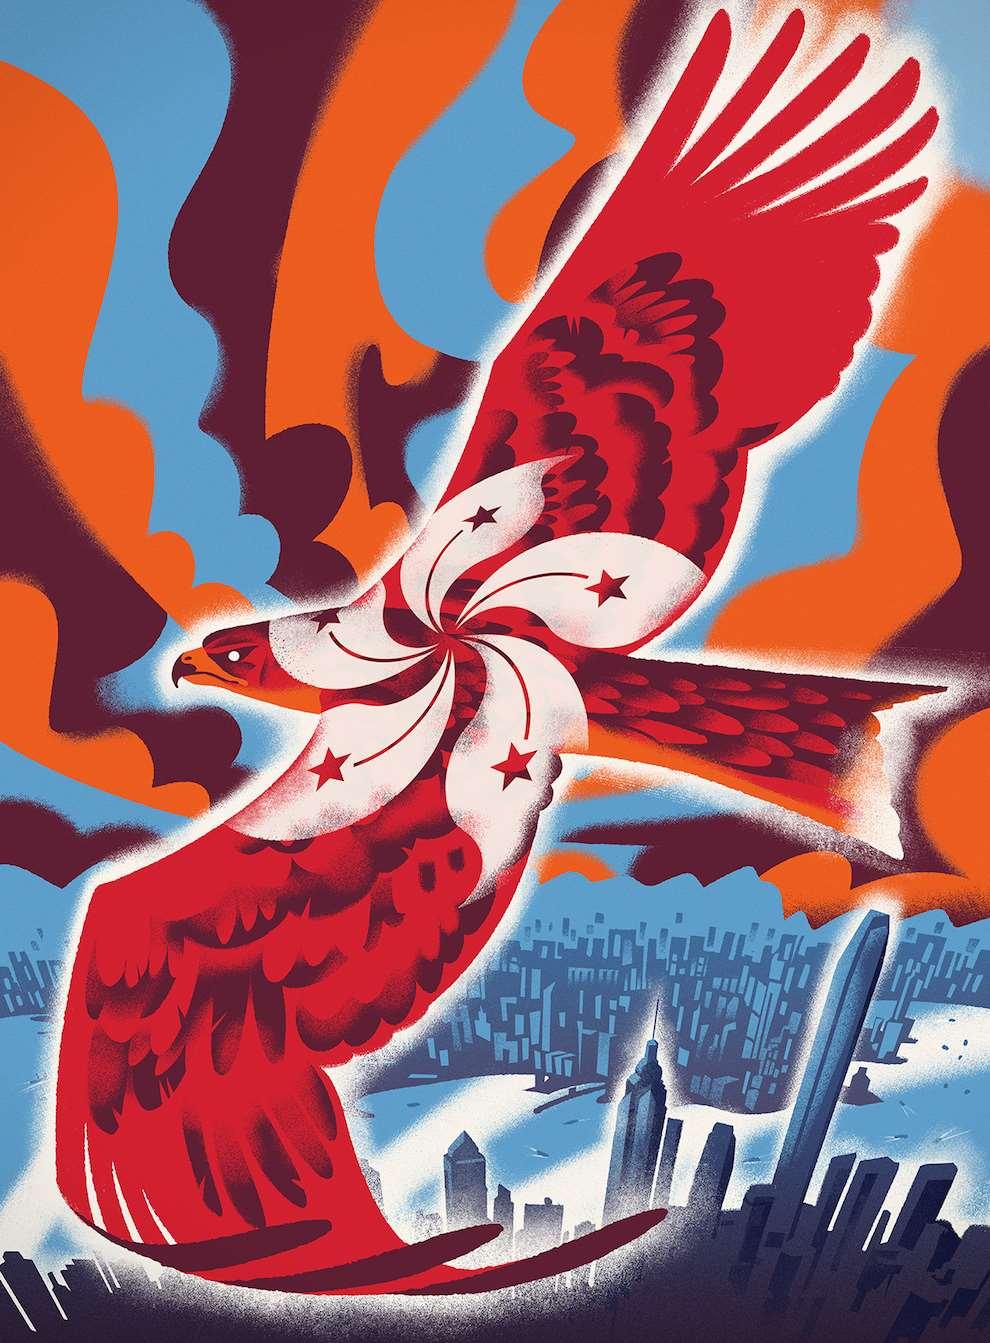 Jan Bielecki, Digital textural illustration of a black kite flying around a city